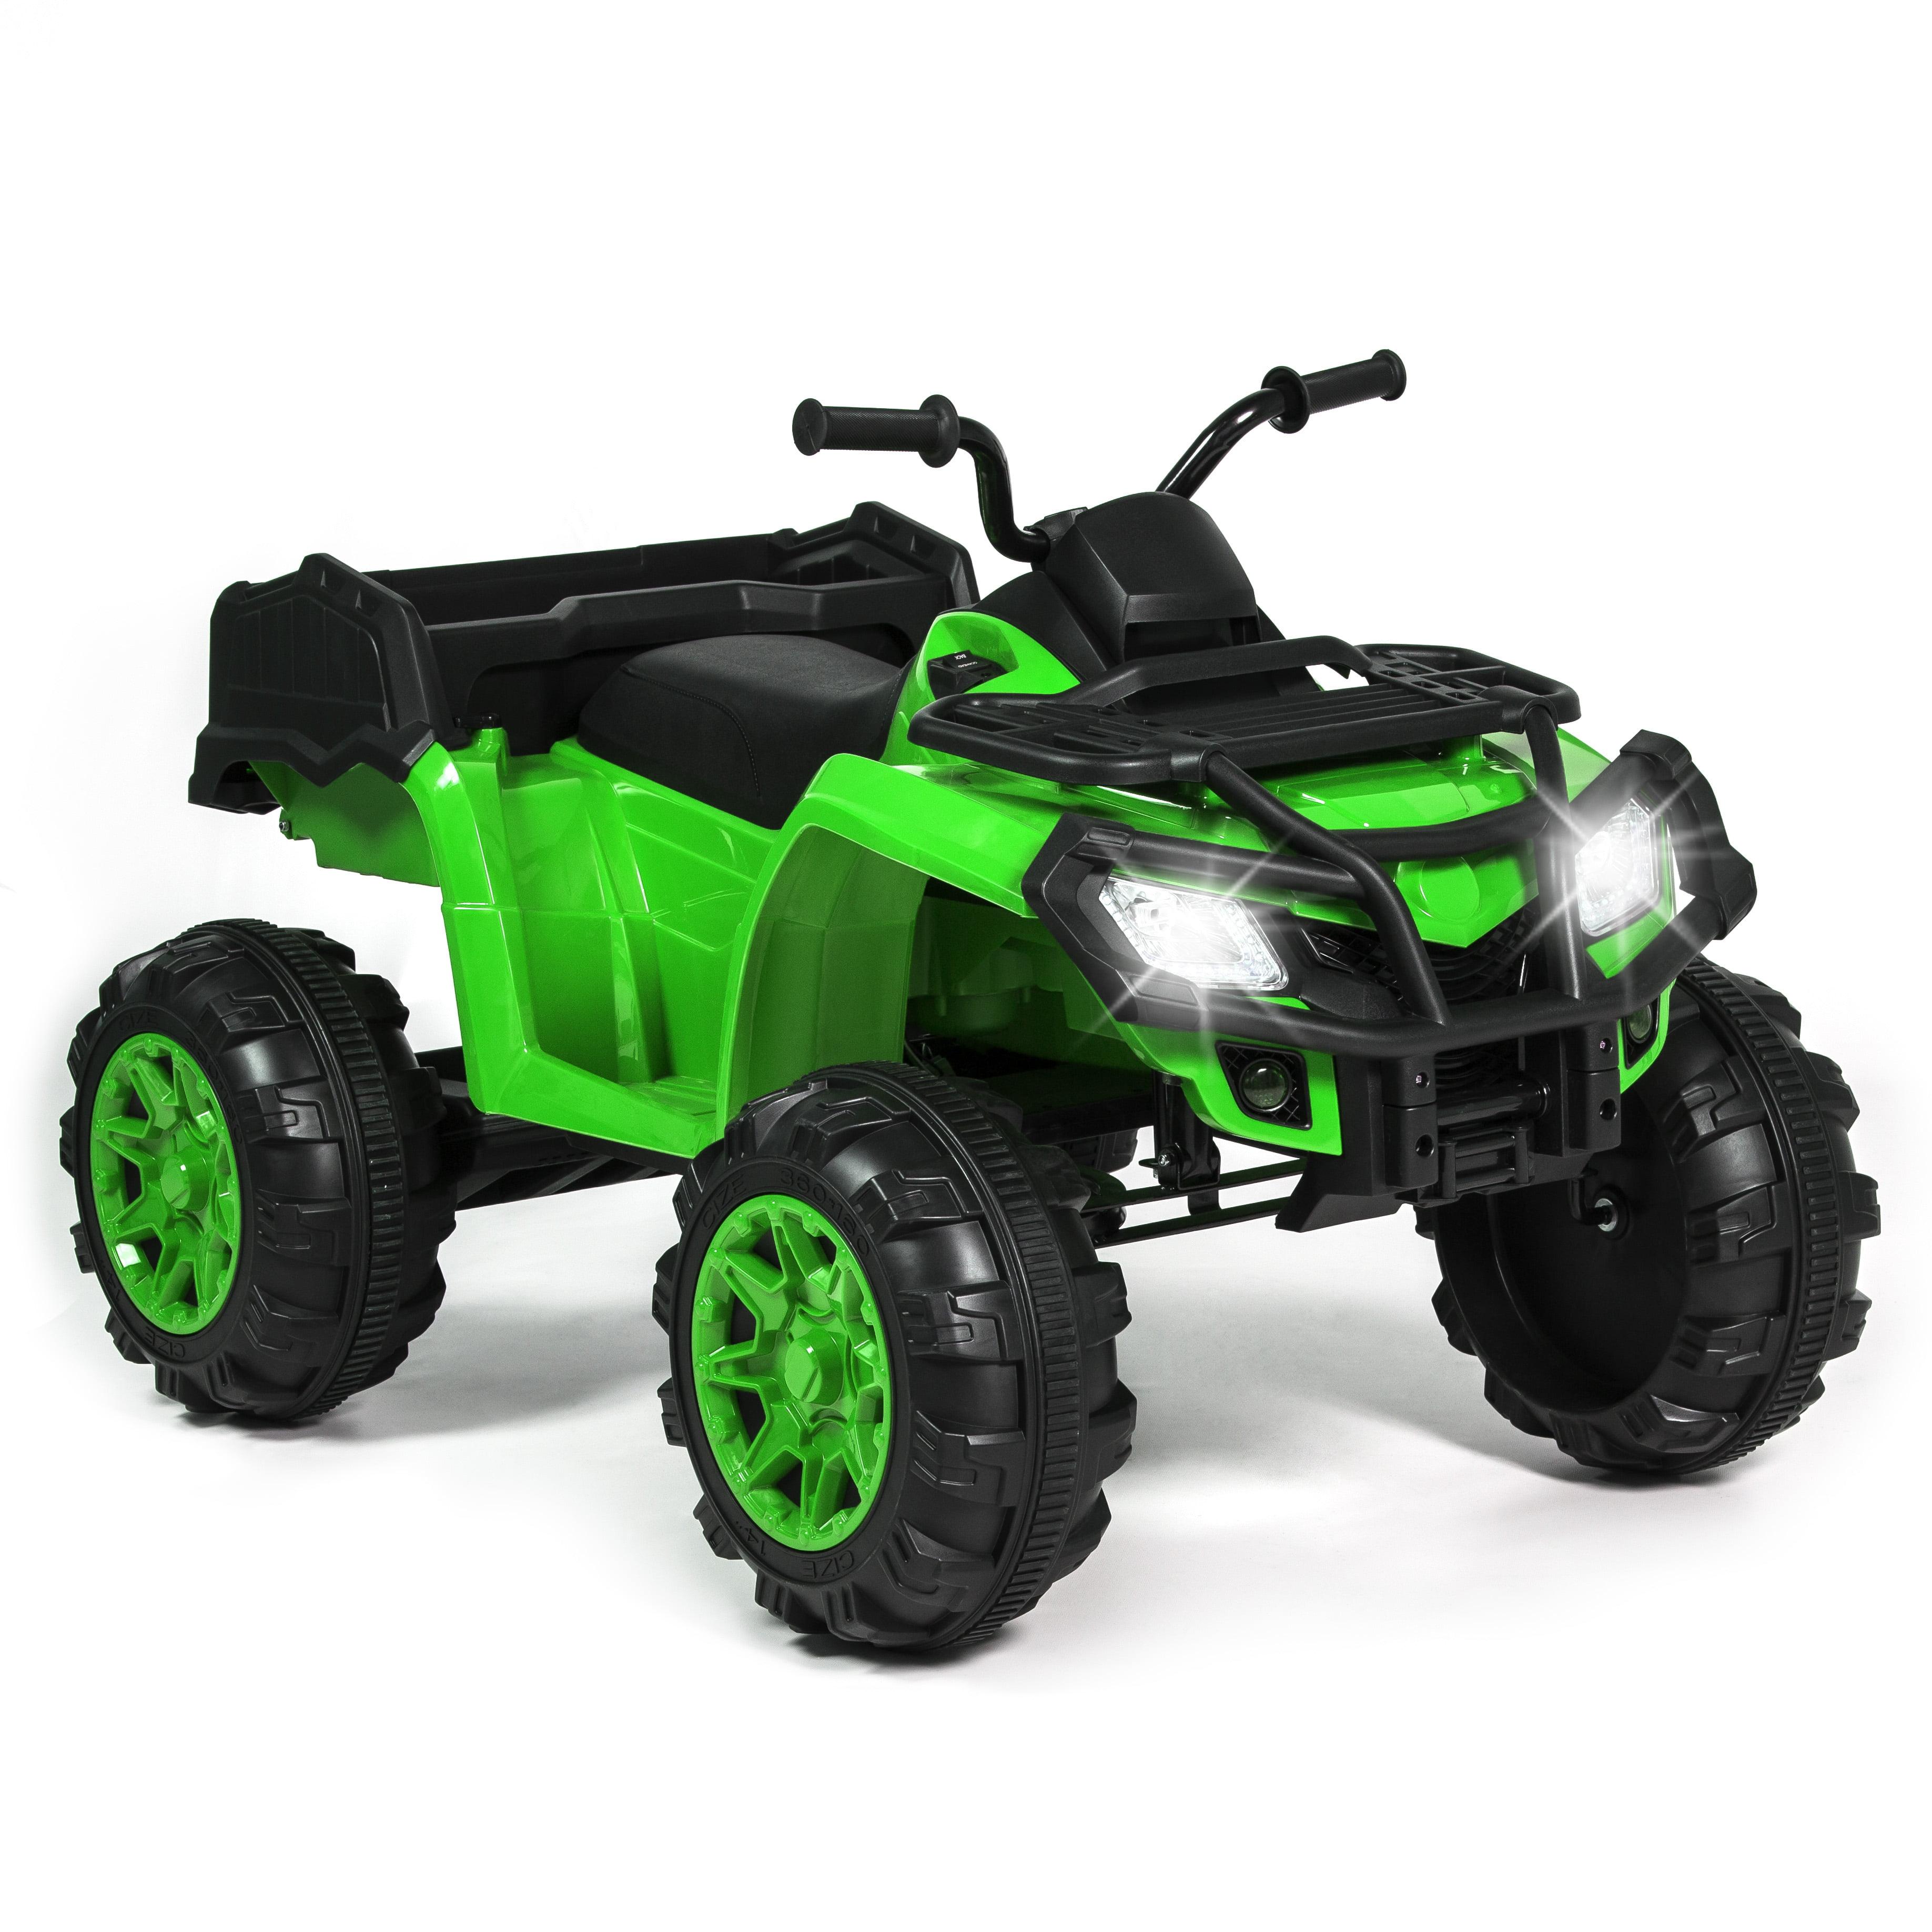 Best Choice Products 12V Kids Powered Large ATV Quad 4-Wheeler Ride-On Car w/ 2 Speeds, Spring Suspension, MP3, Lights, Storage - Green